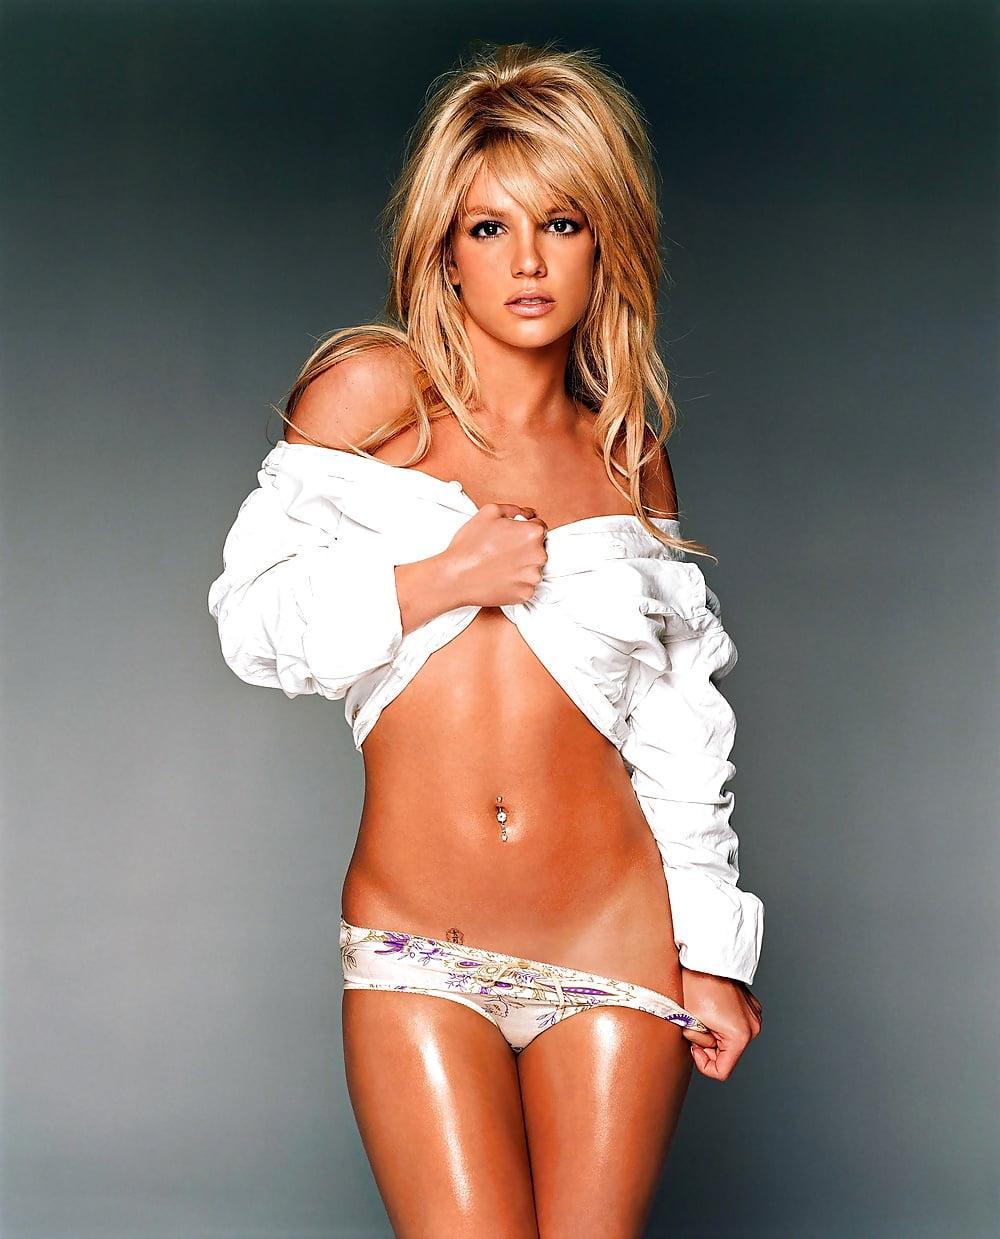 Britney spears crossroads pics